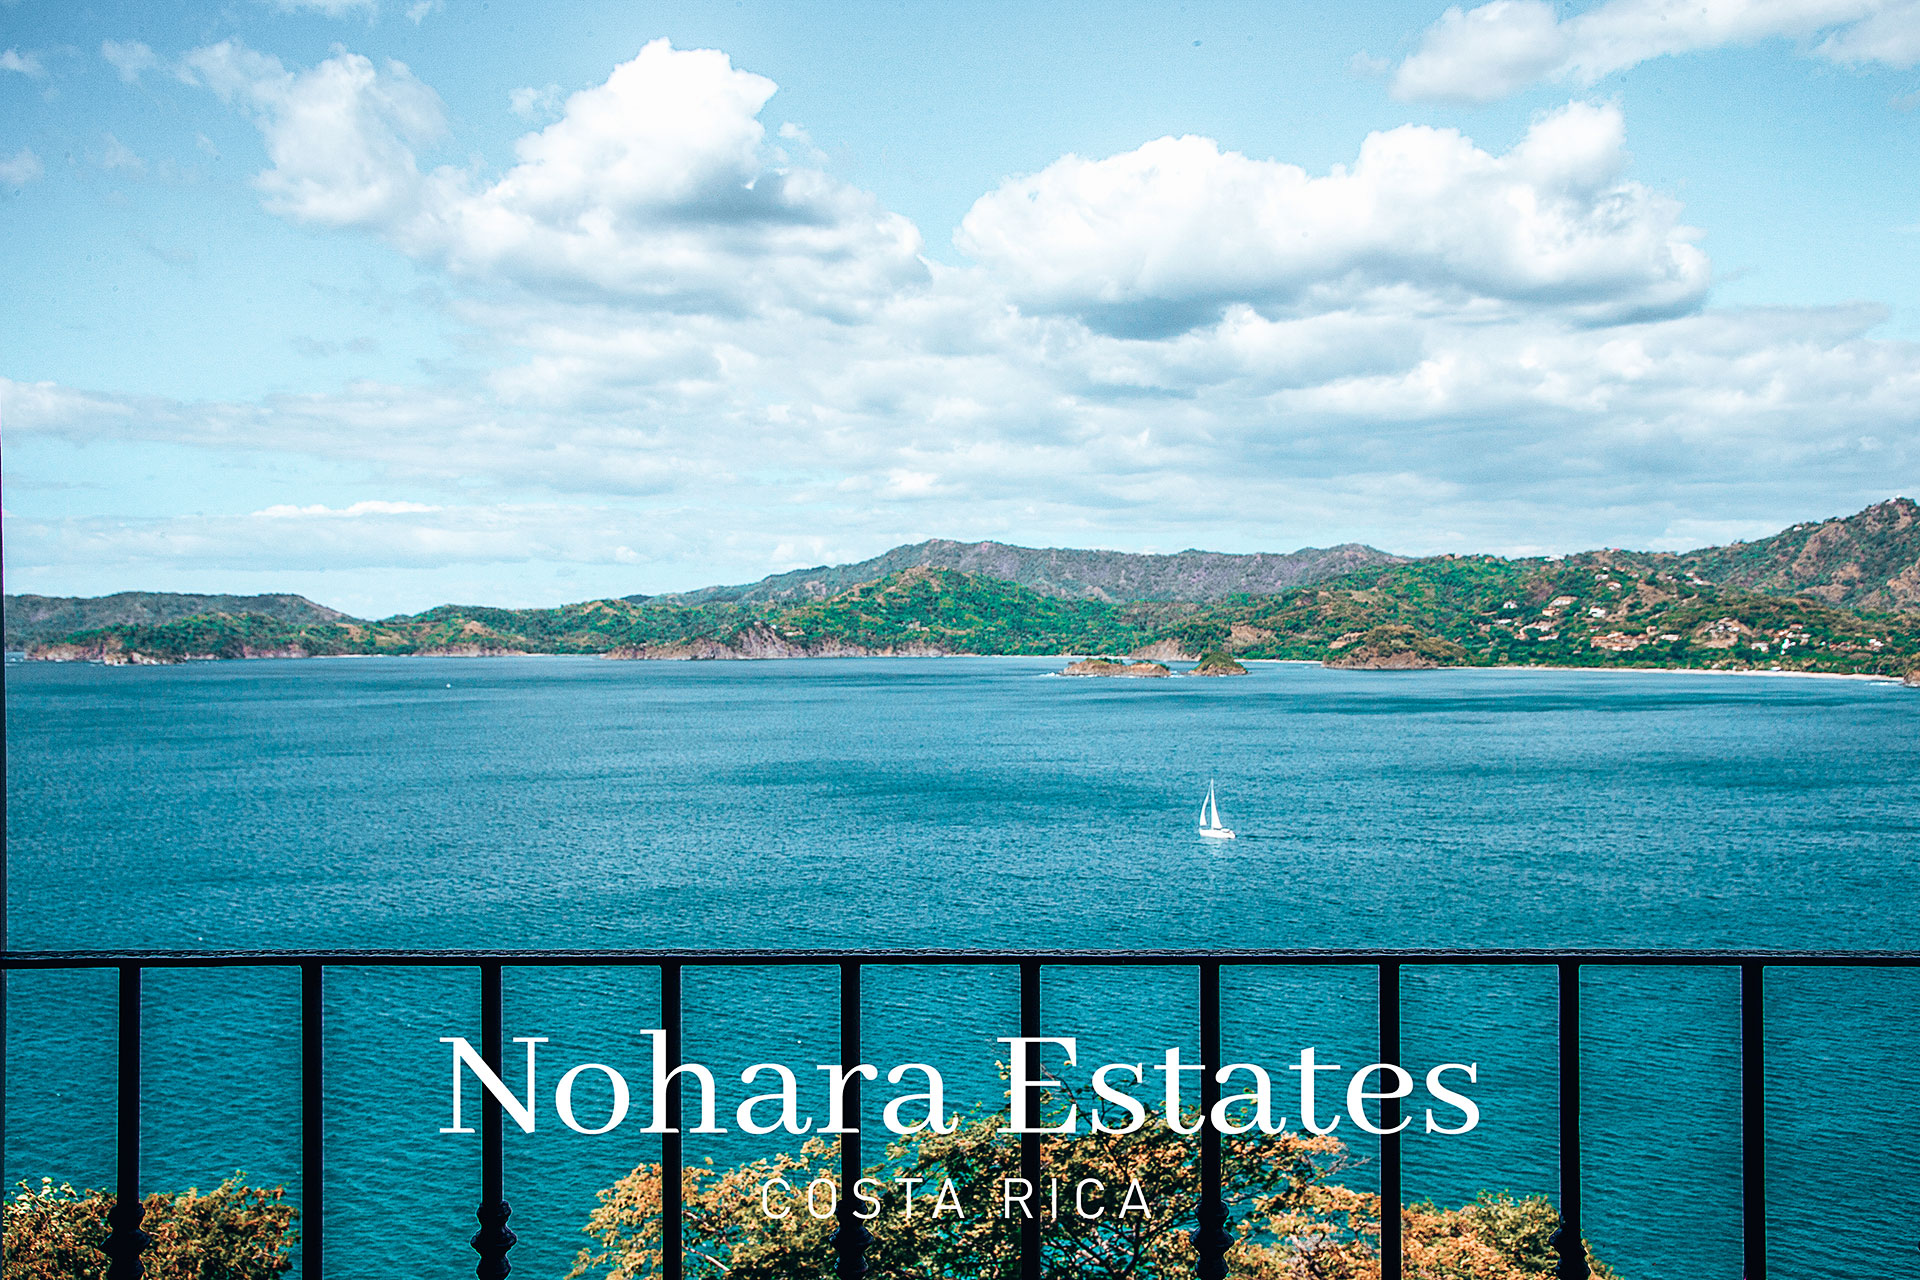 Nohara Estates Costa Rica 360 Esplendor Del Pacifico Area 8